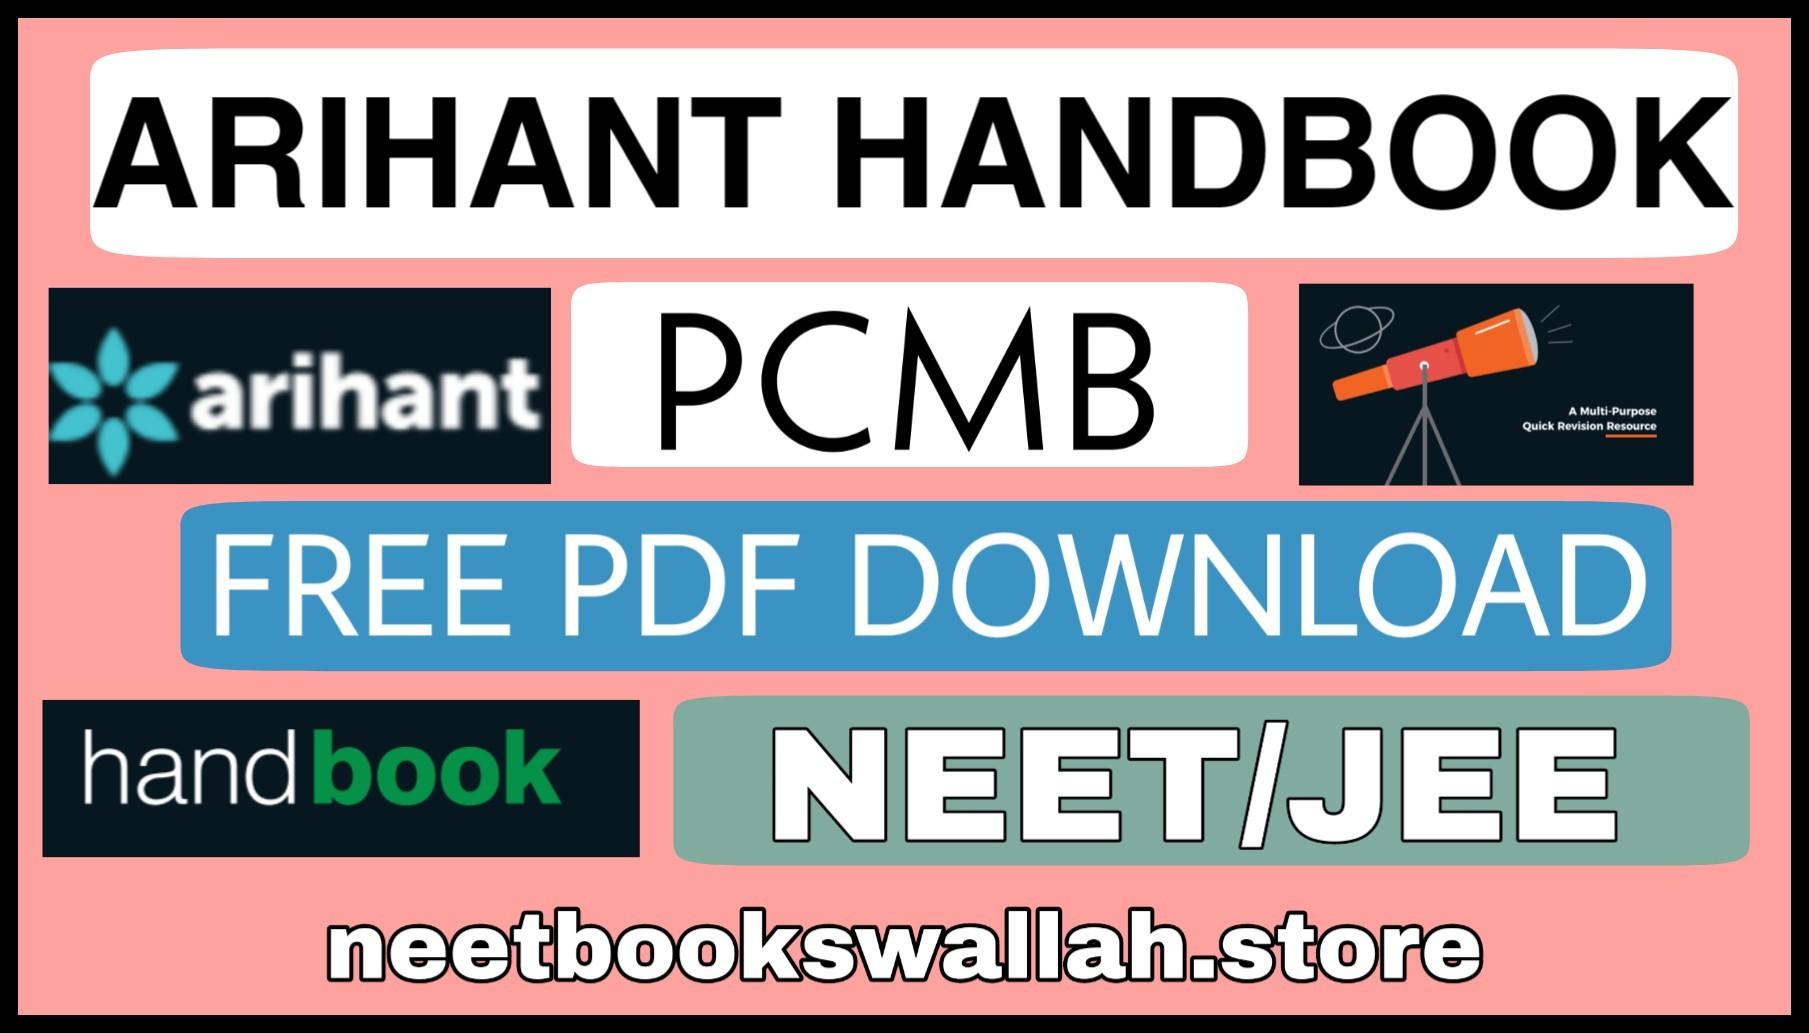 arihant physics neet pdf free download